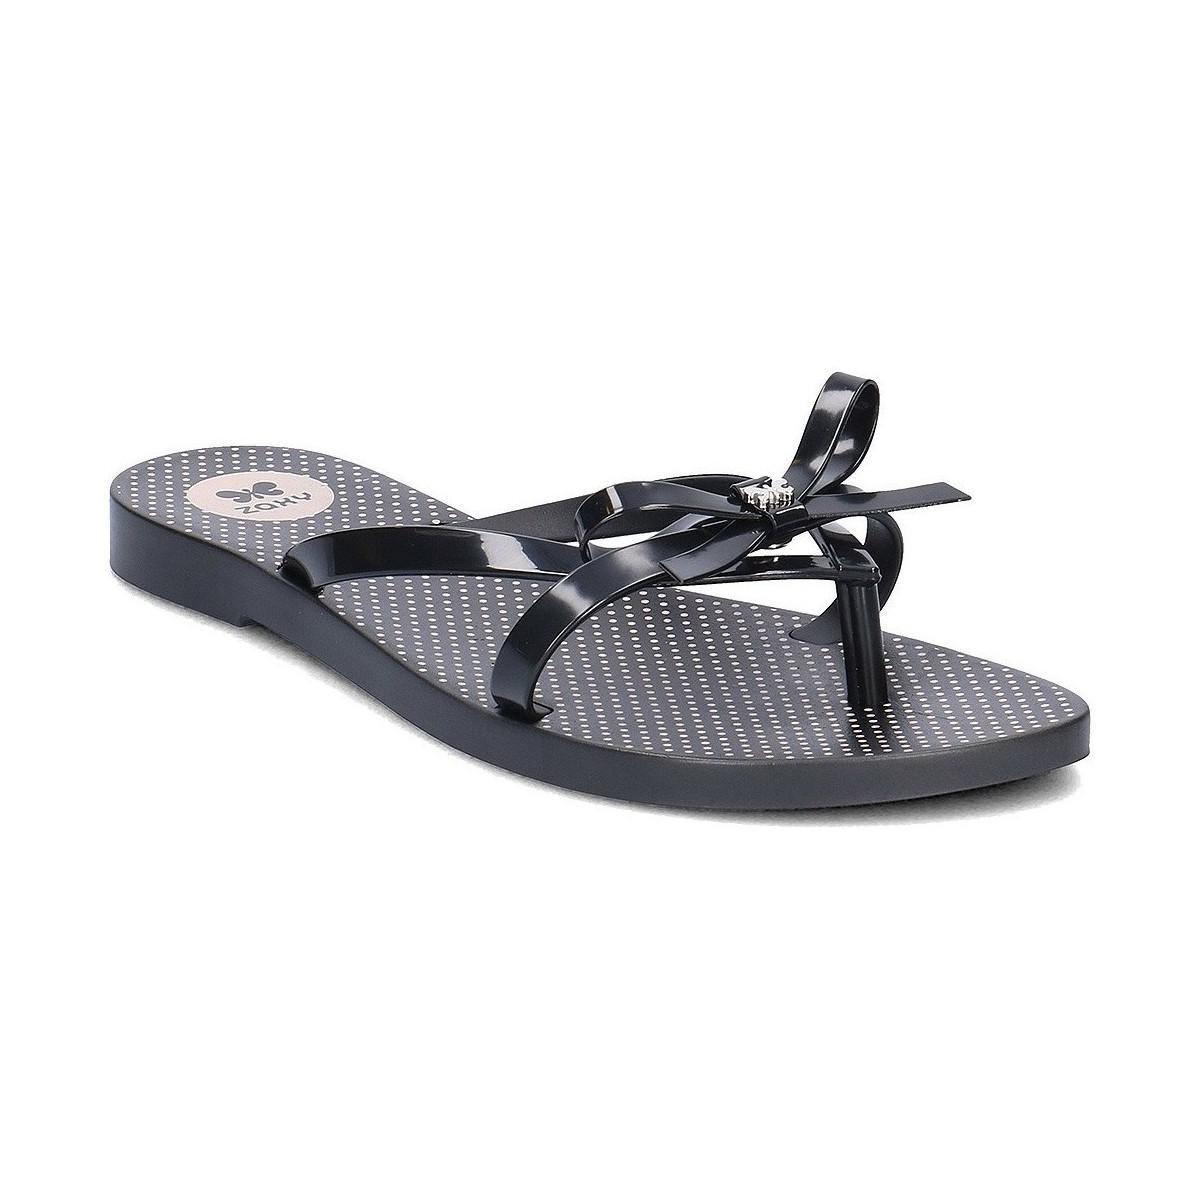 3a81e20635bc80 Zaxy Fresh Top Women s Flip Flops   Sandals (shoes) In Black in ...